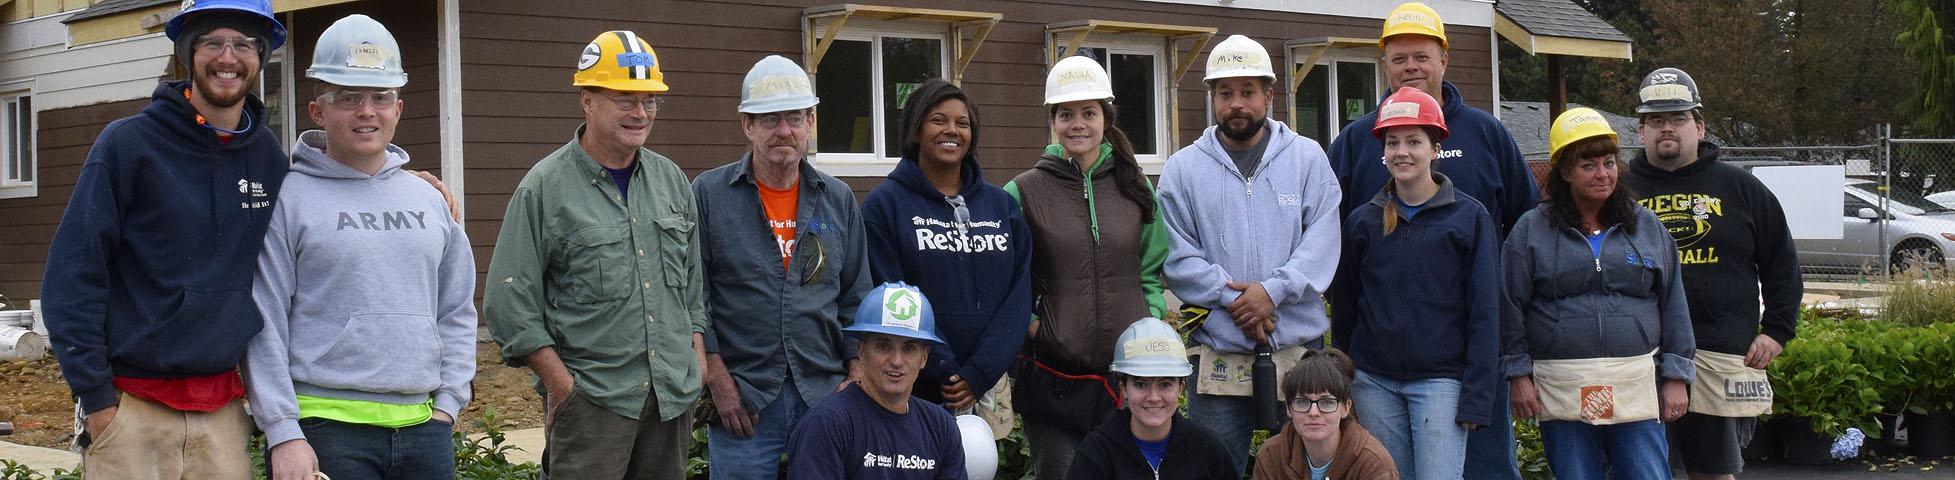 image of ReStore staff volunteering at Glisan Garden build site